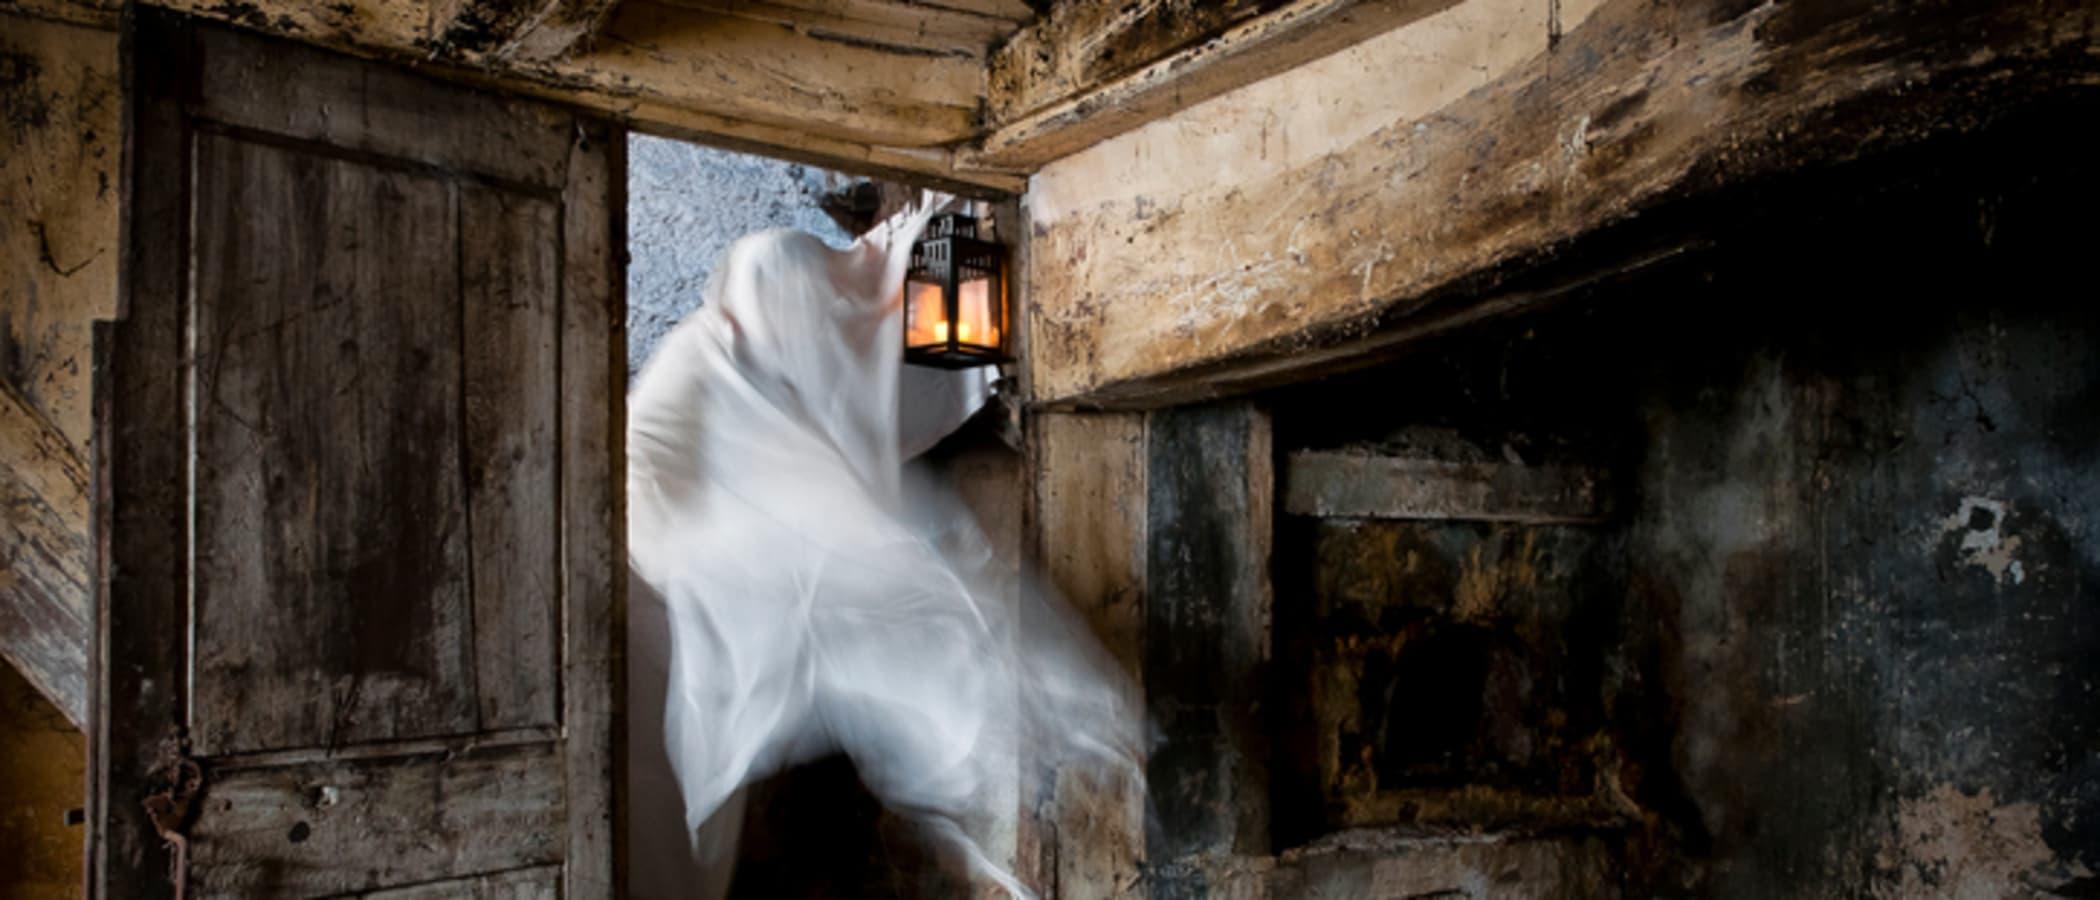 'Ghosting' Behavior Baffles HR Pros, Hiring Managers